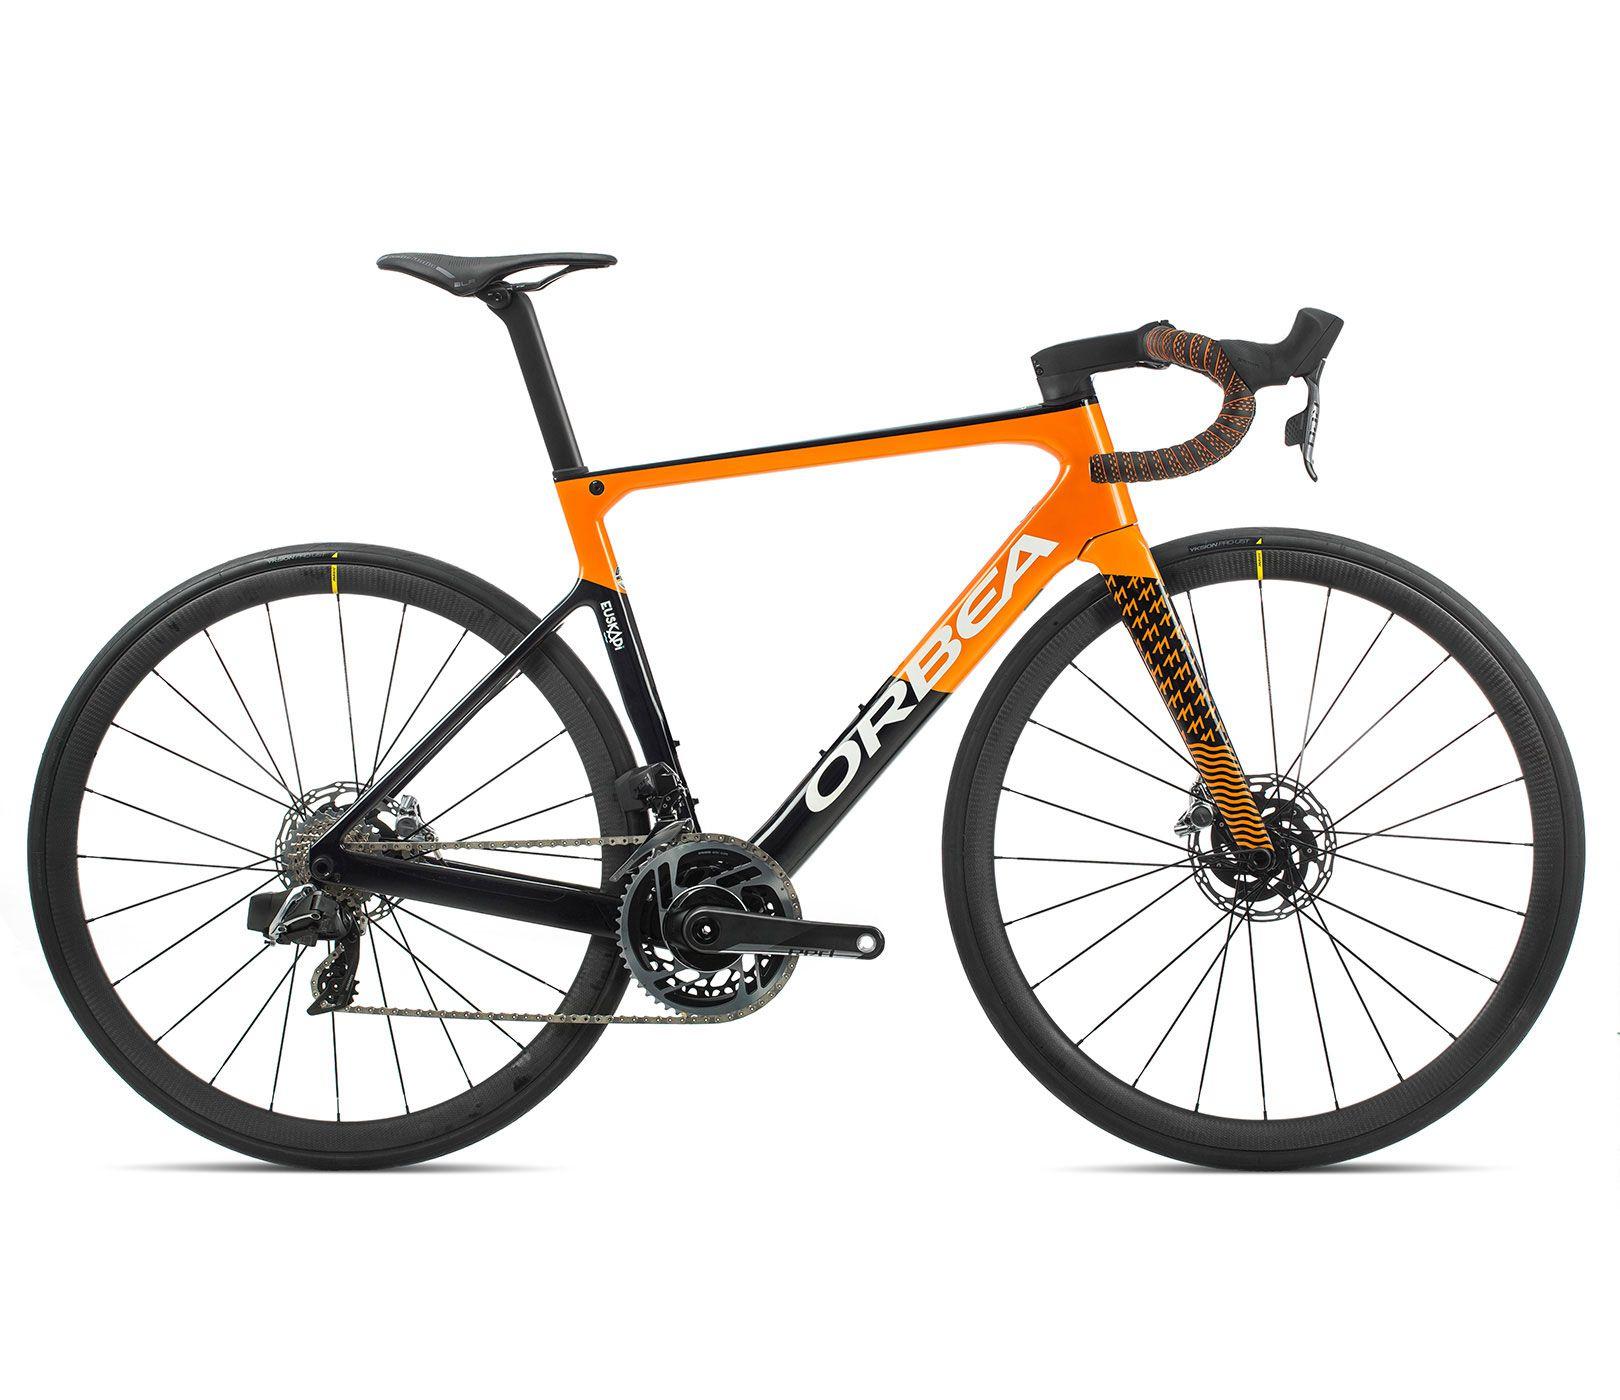 Bicicleta estrada Orbea Orca OMX M11eLTD-D, 51, Cor Team Euskadi - 2020